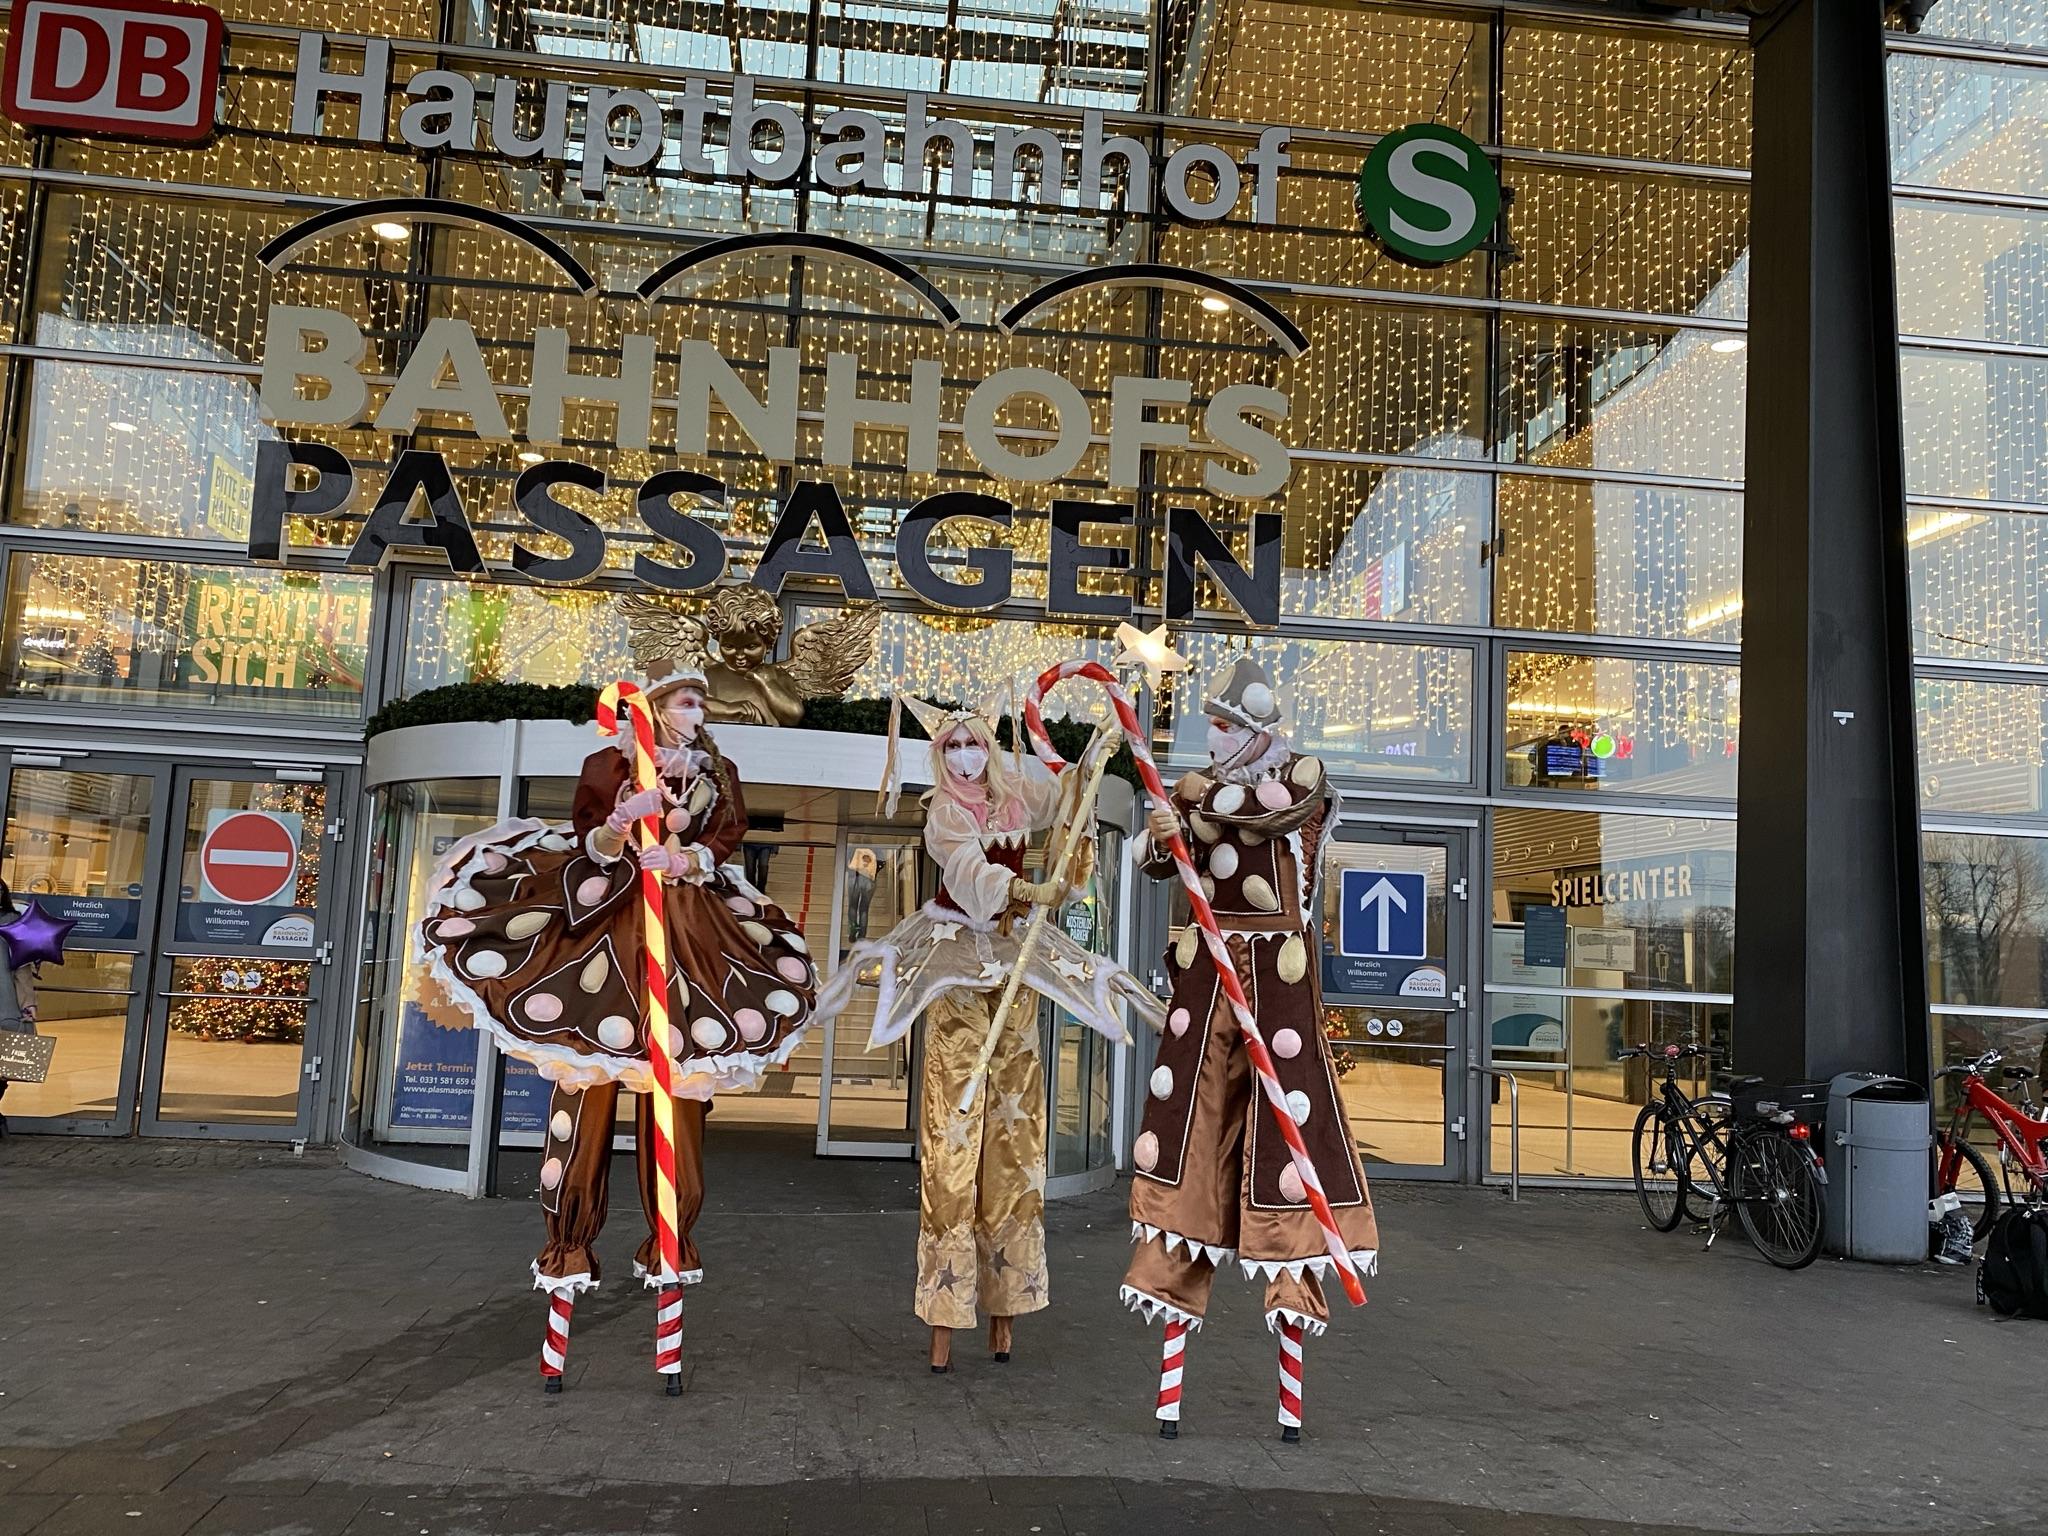 Stilt walkers in Christmas costumes